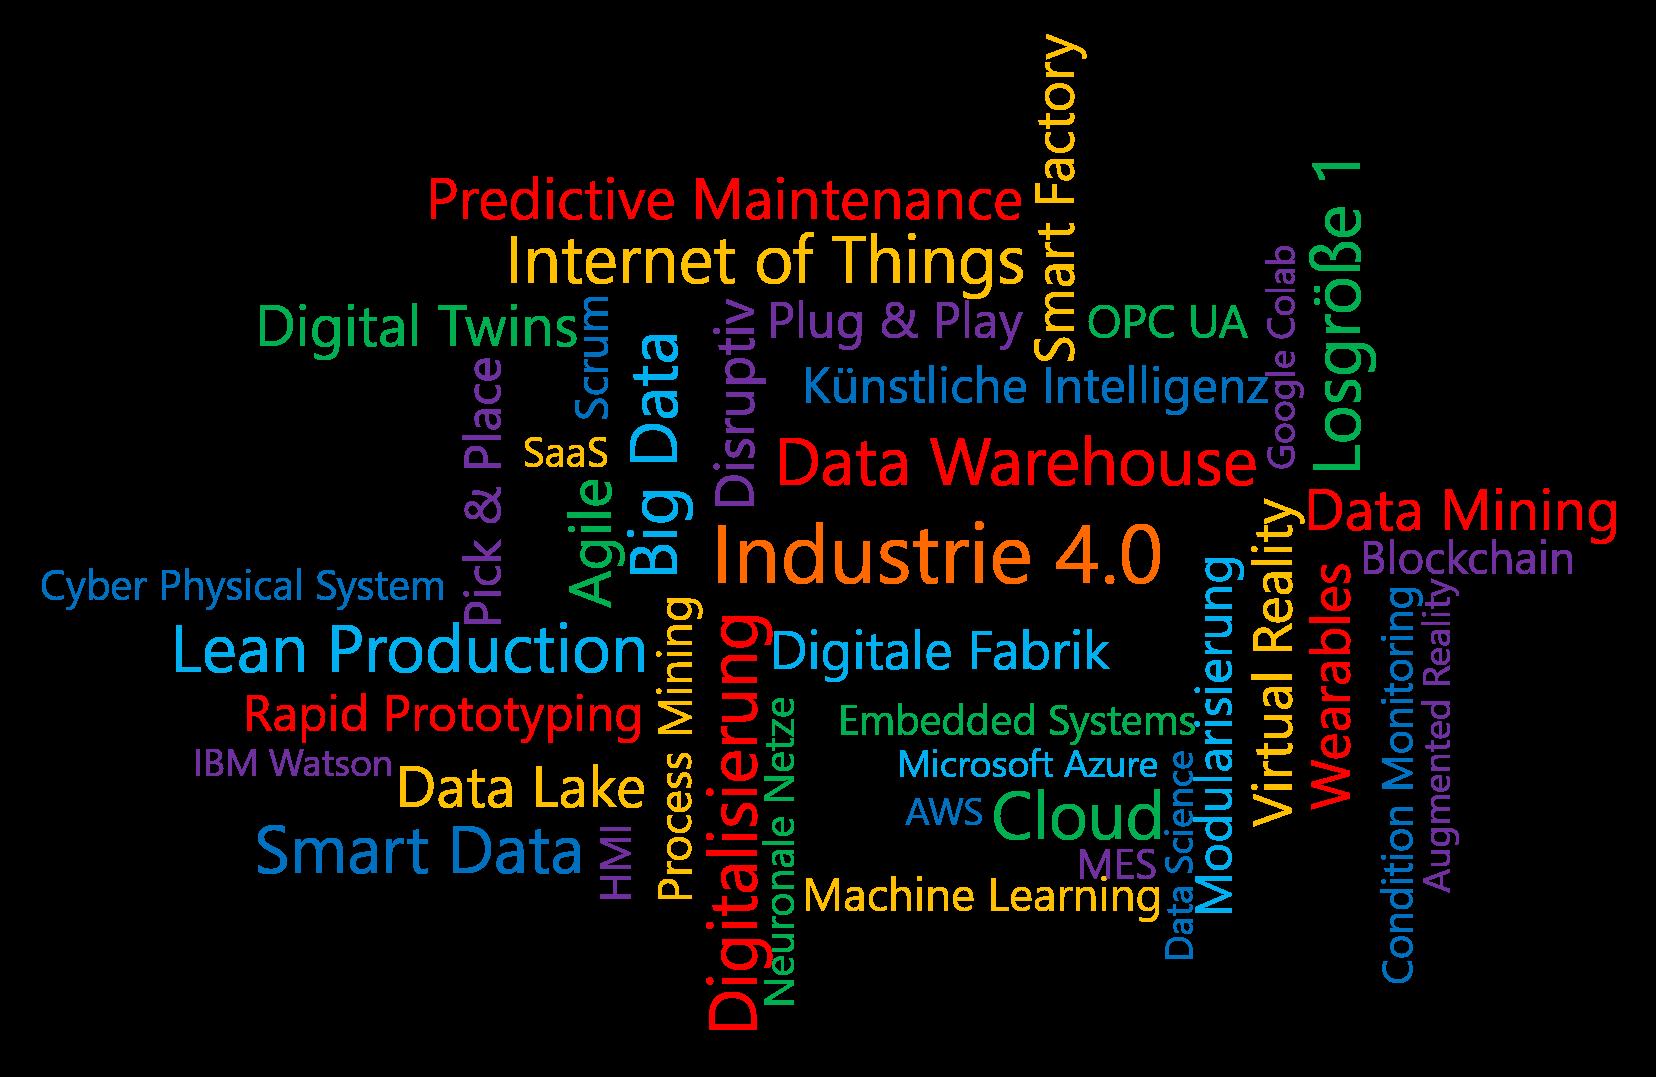 IoT , Big Data, Industrie 4.0, Data Mining